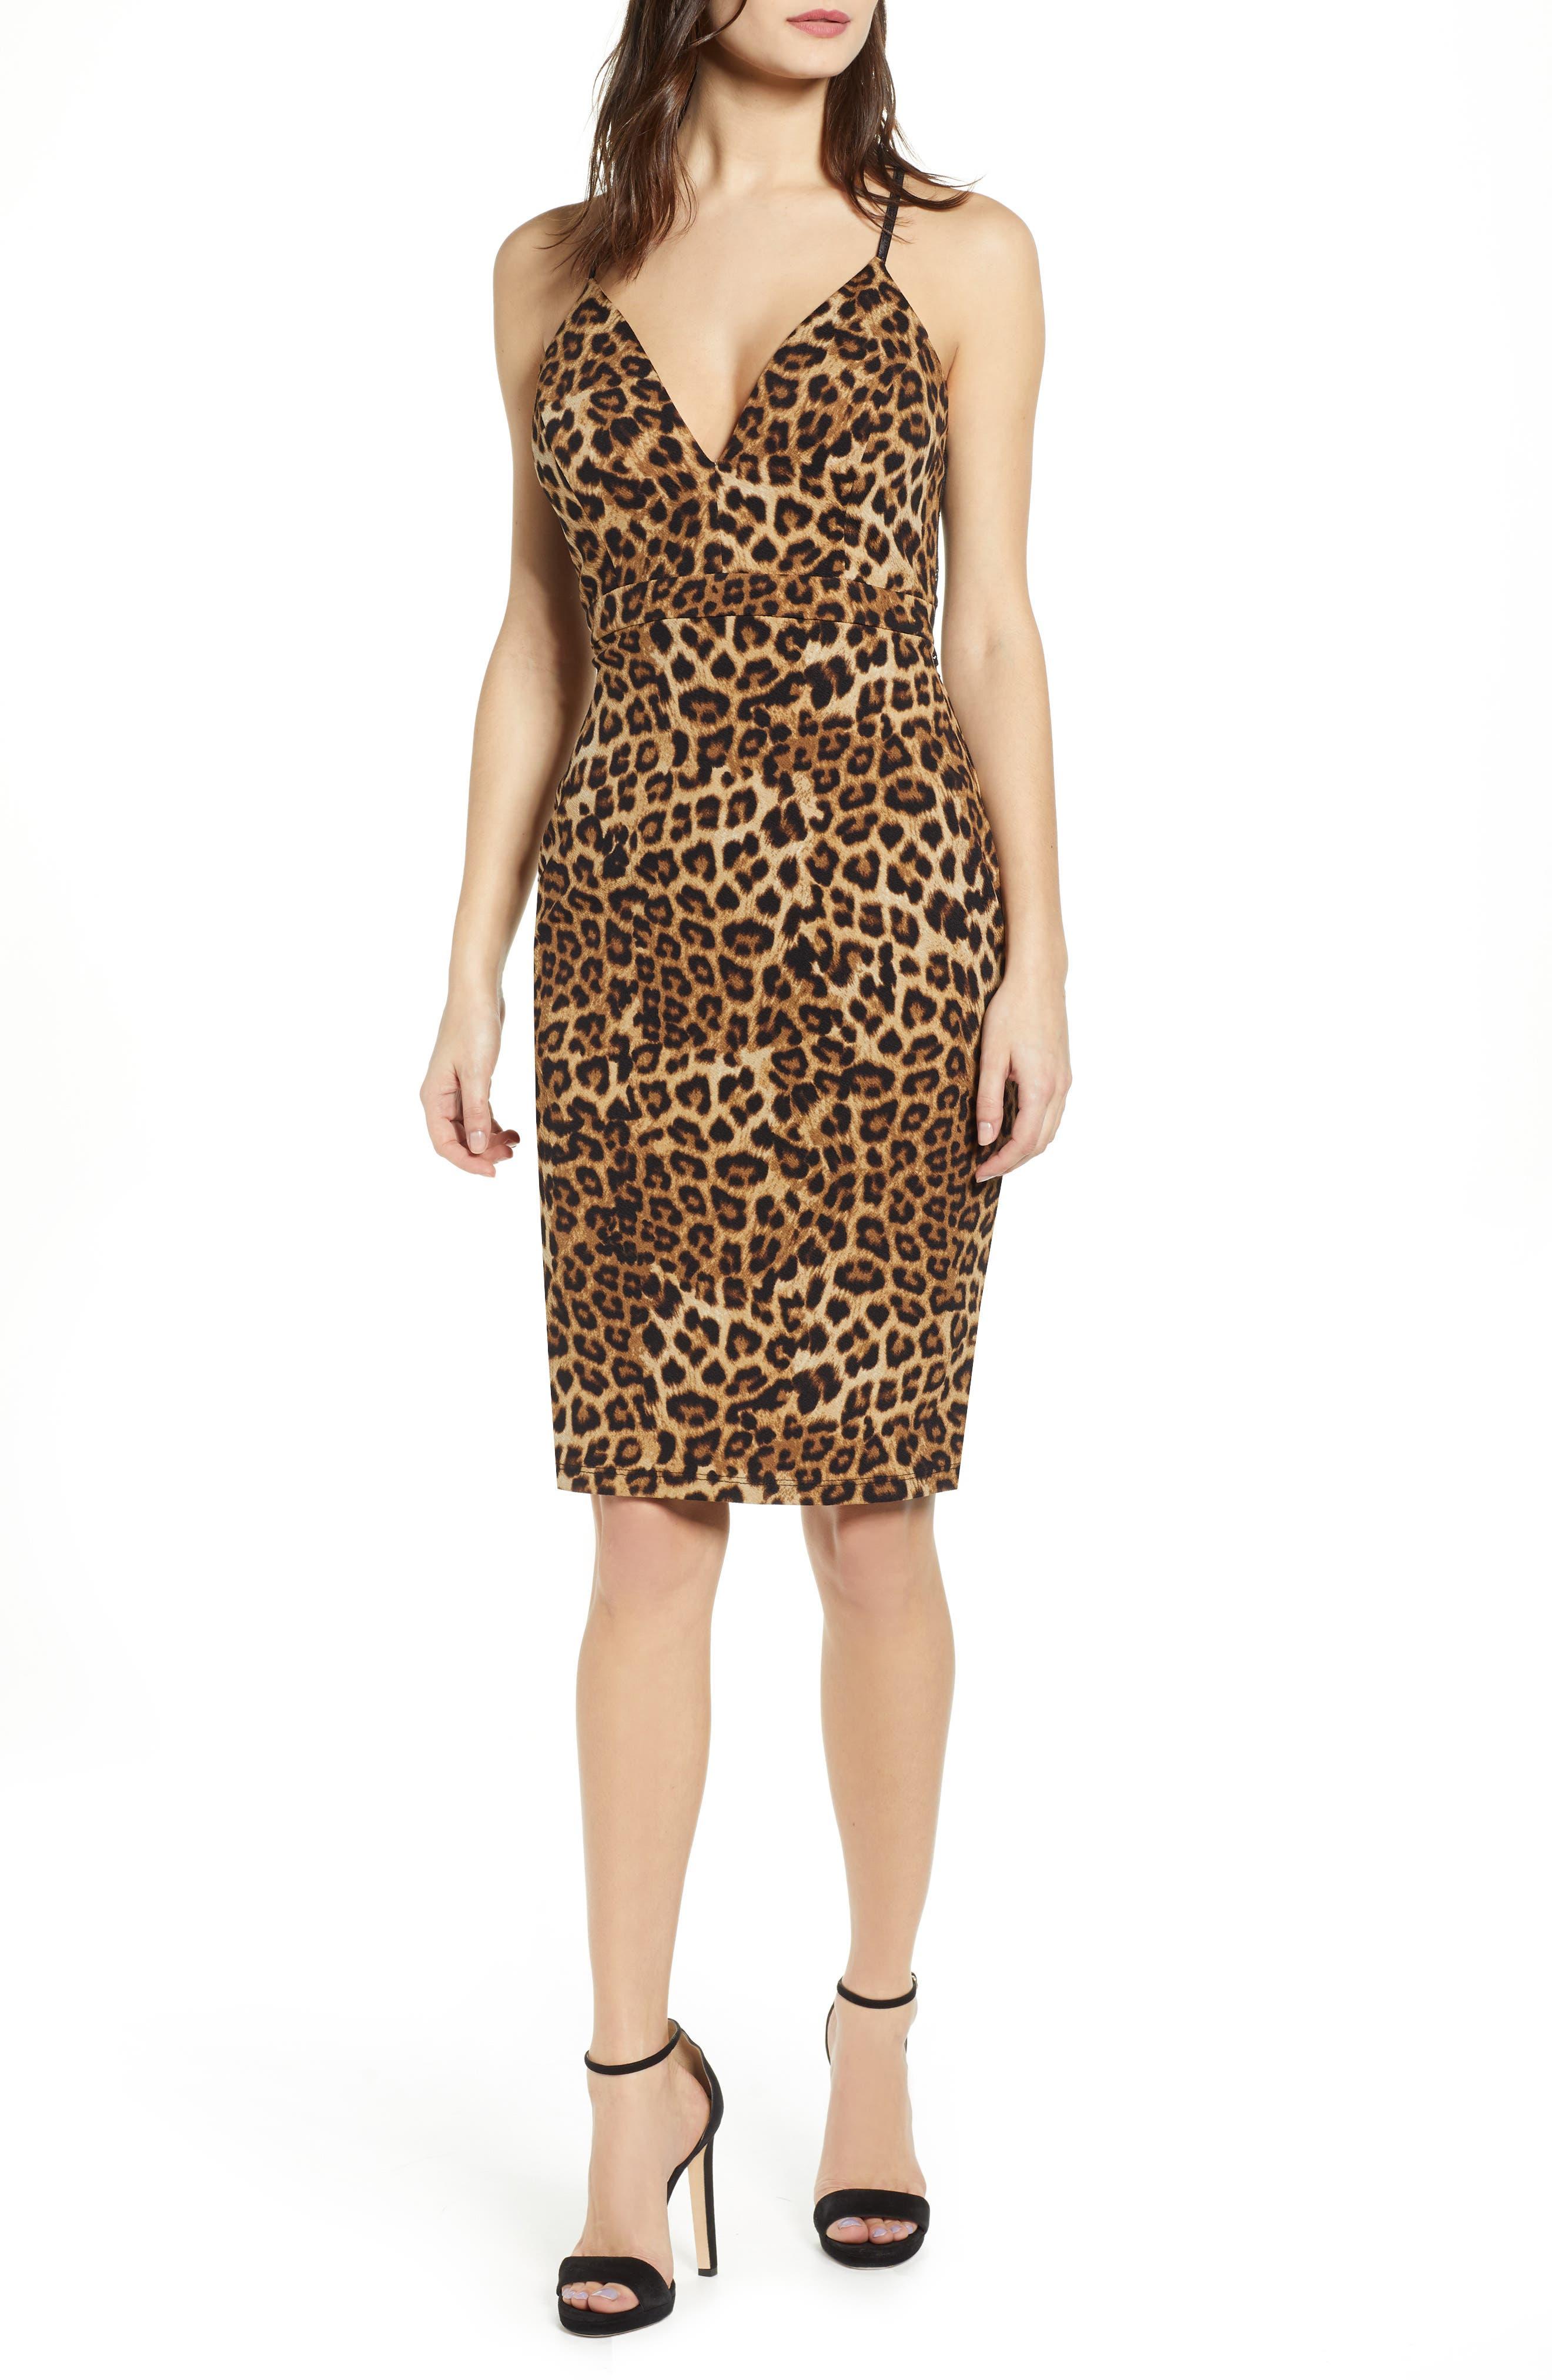 Love, Nickie Lew Leopard Print Lace Back Detail Body-Con Dress, Black